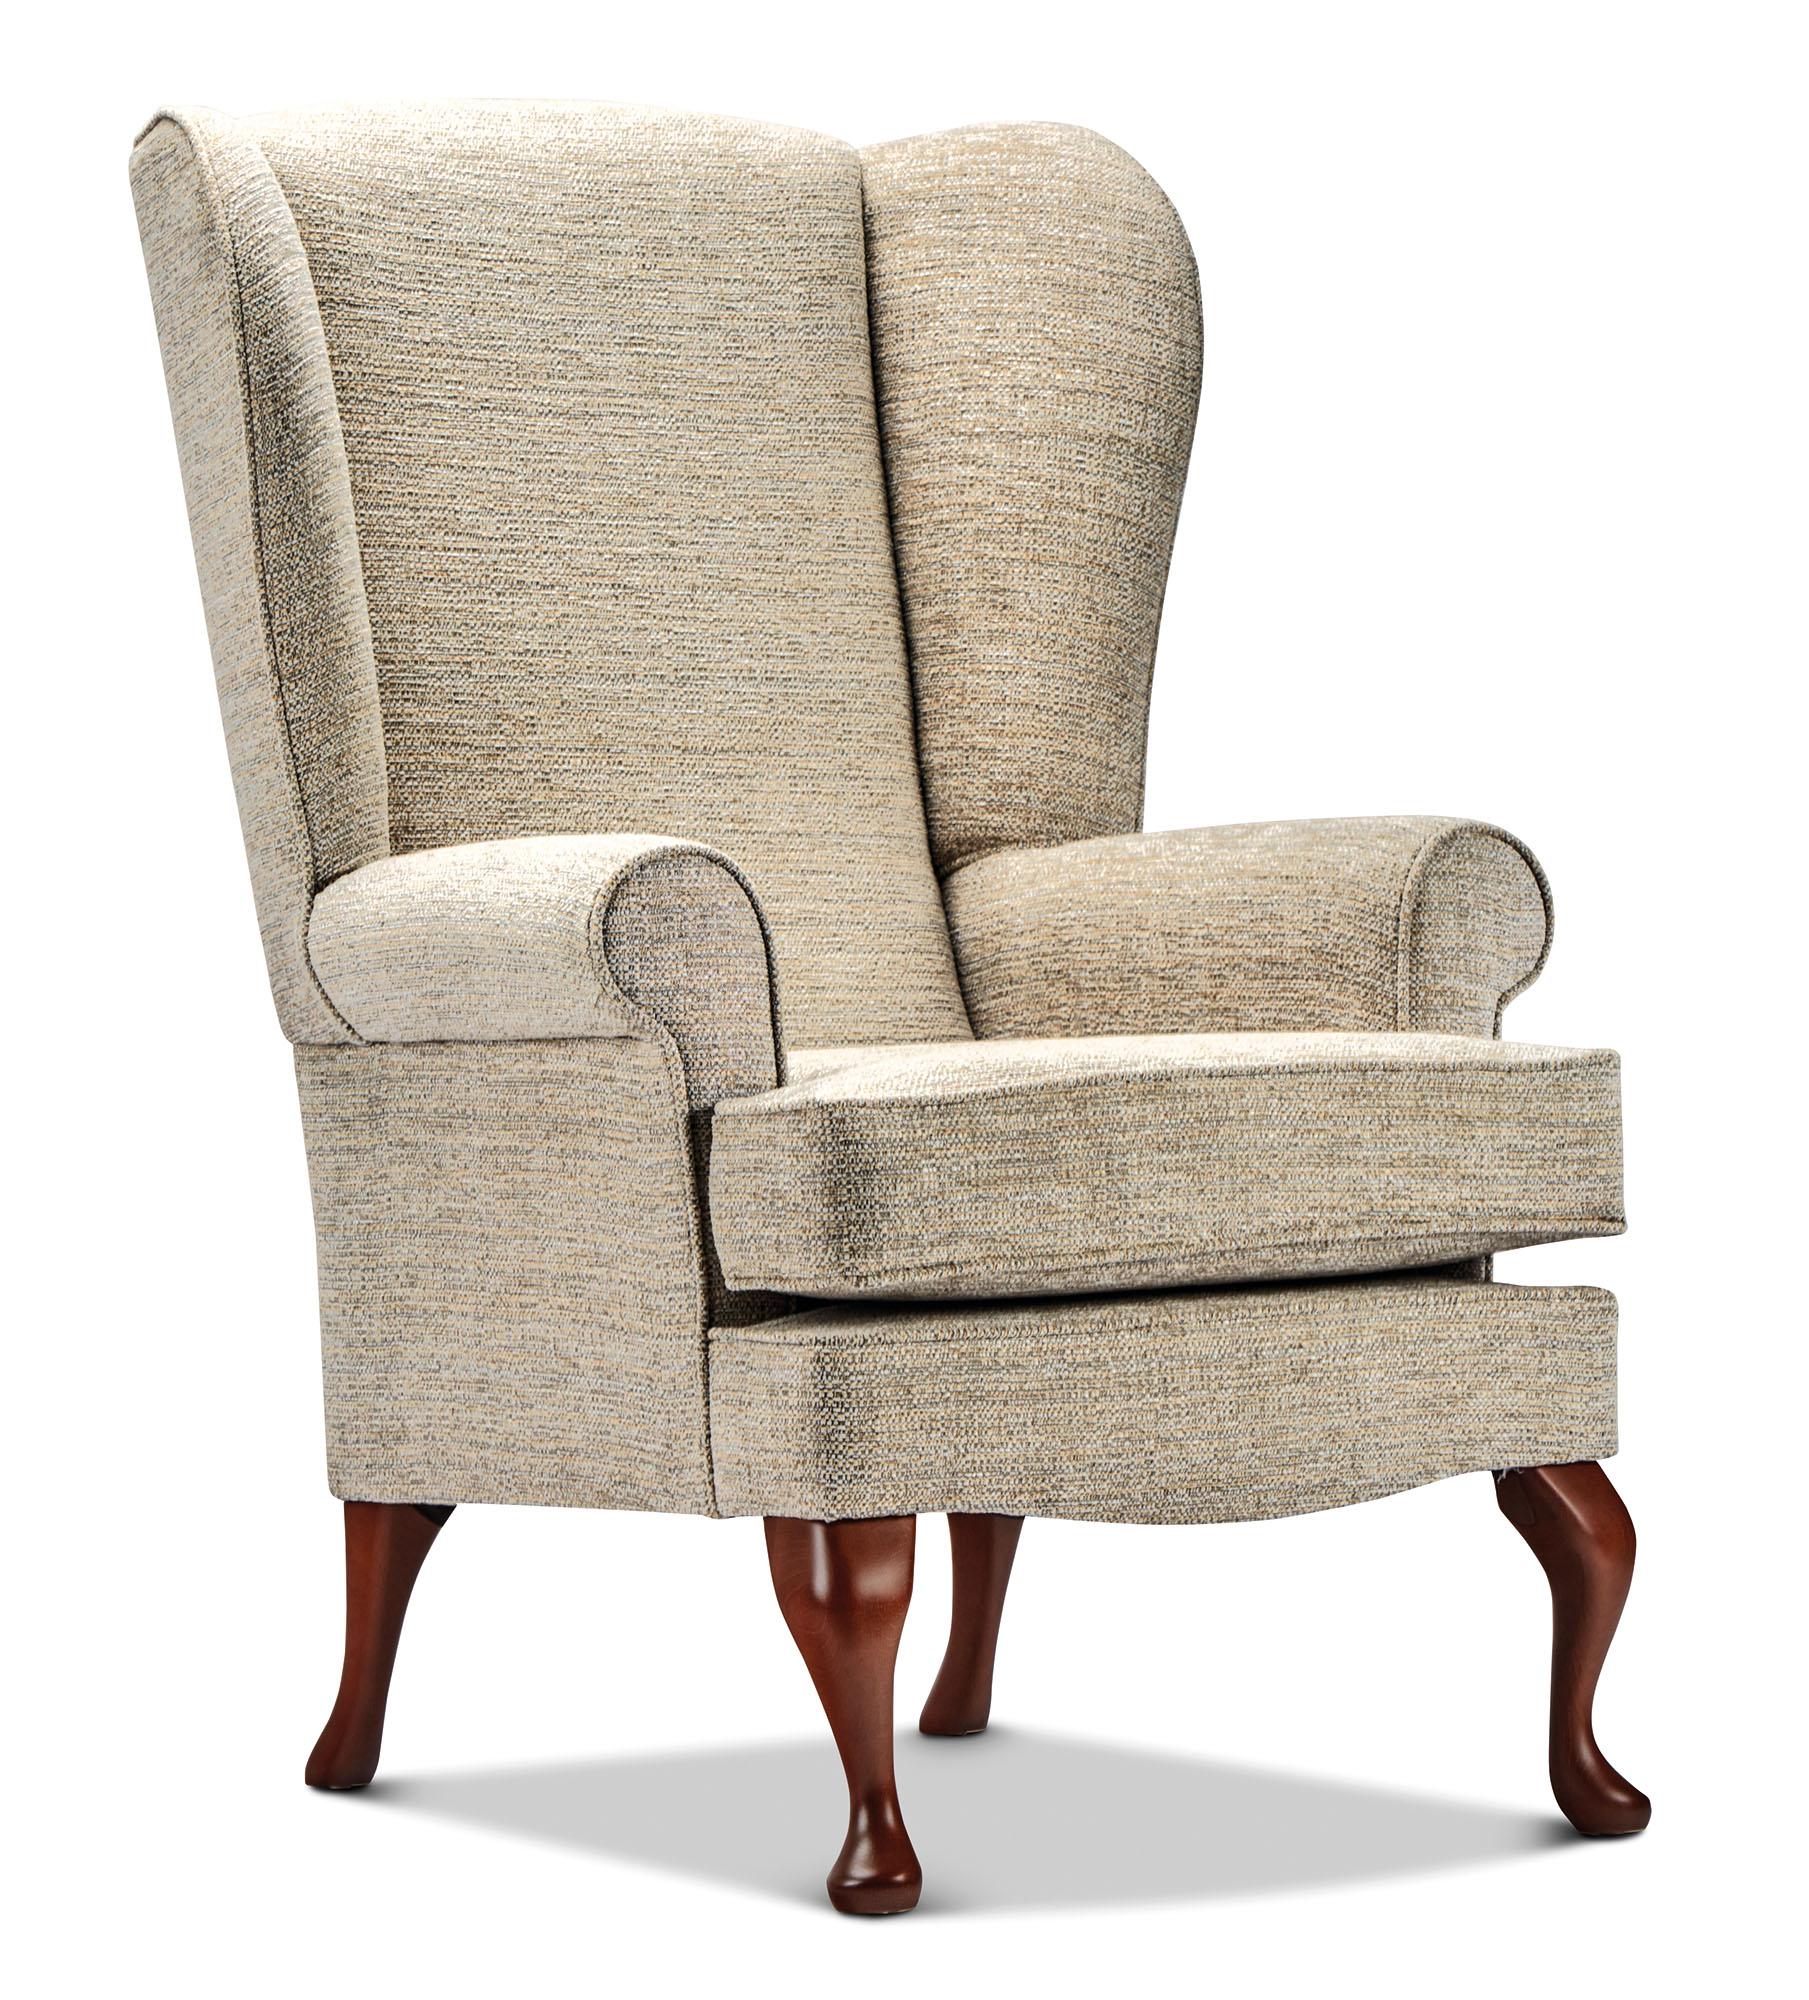 Cool Buckingham Standard Fabric Chair Sherborne Upholstery Creativecarmelina Interior Chair Design Creativecarmelinacom